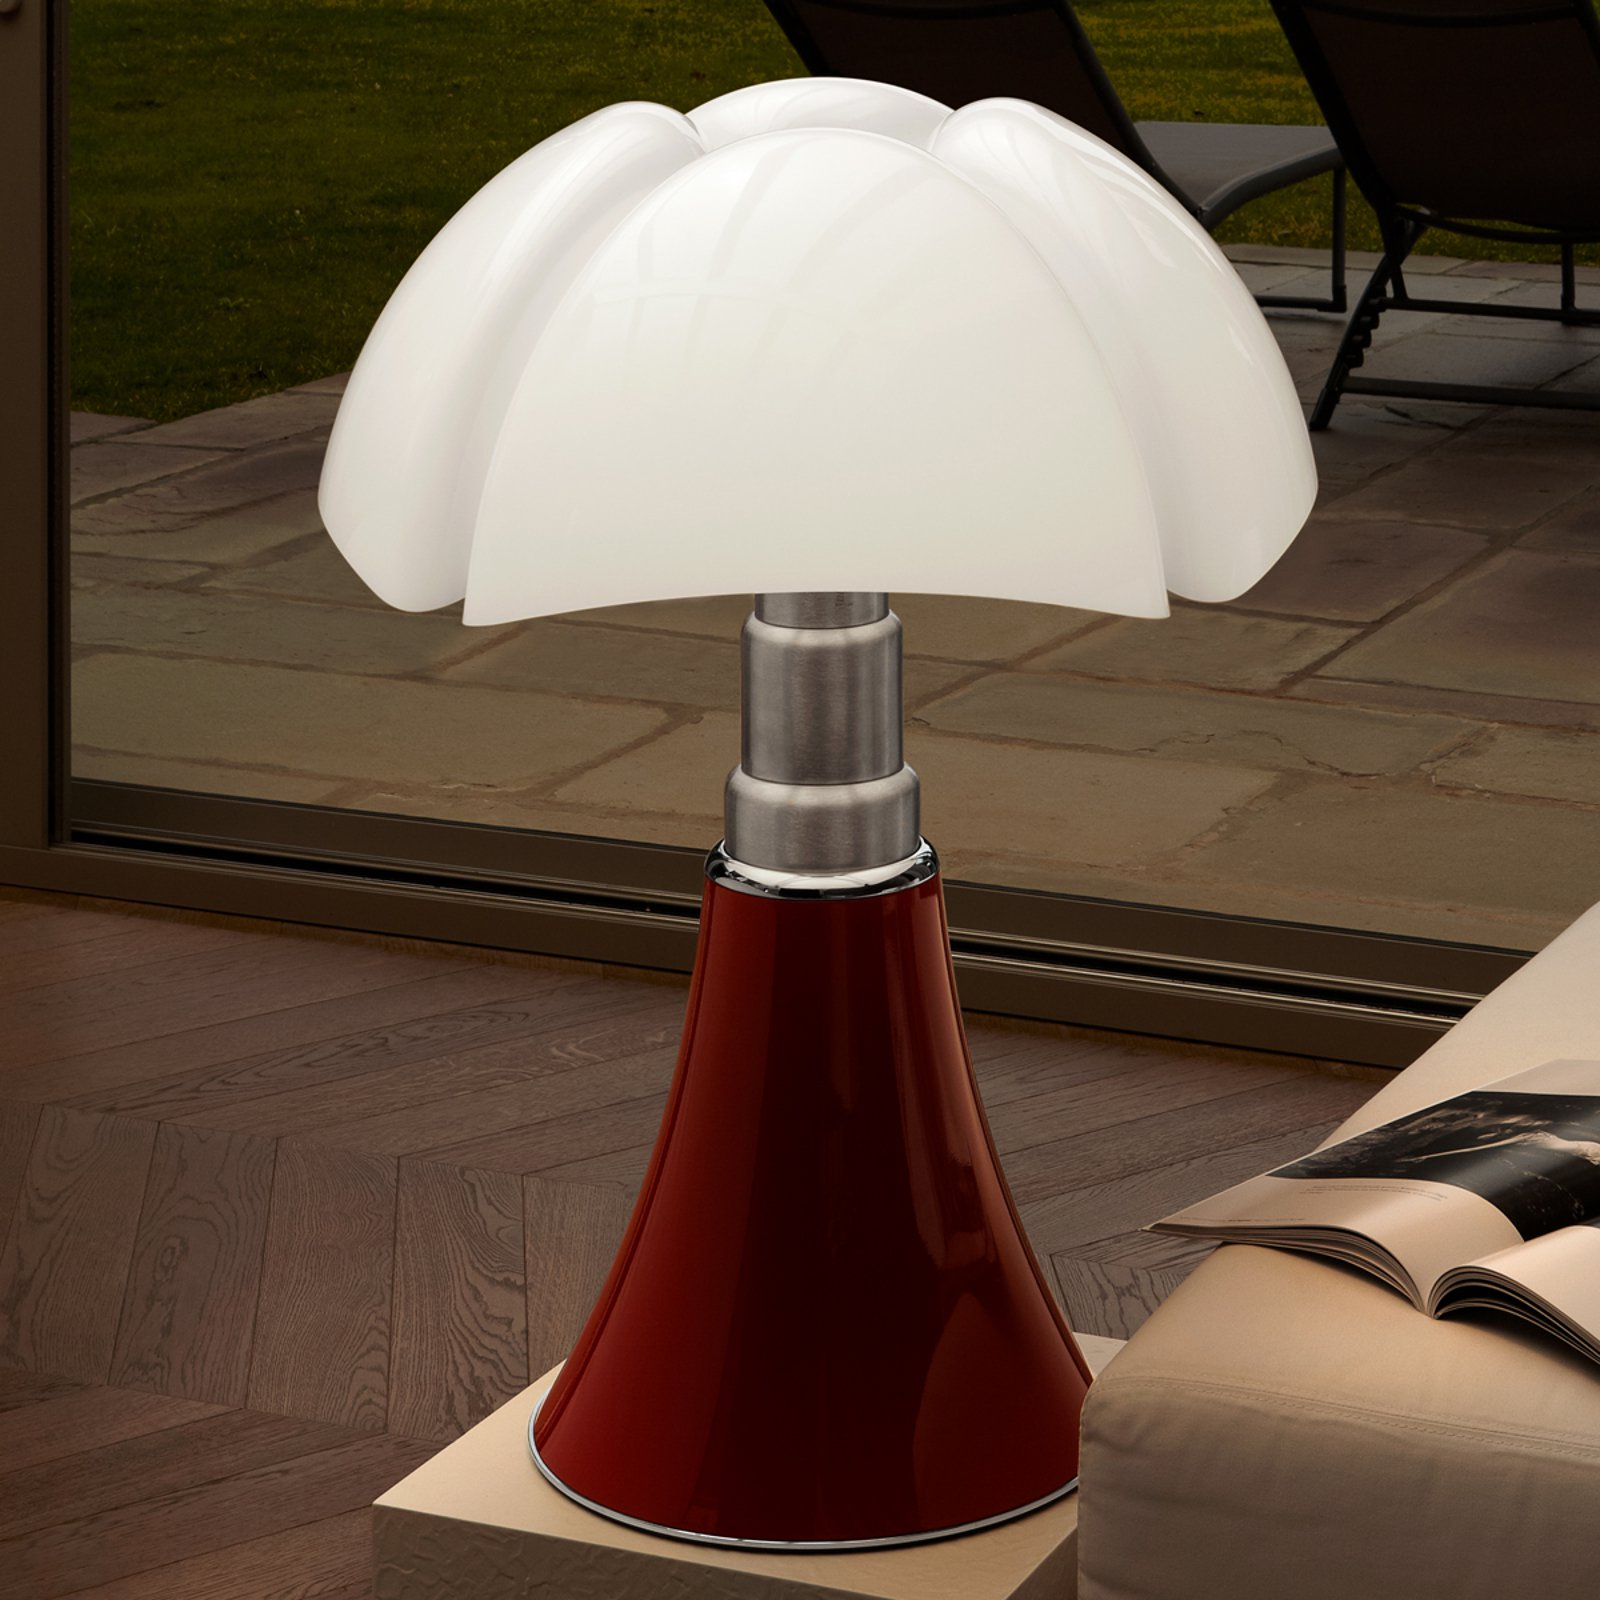 Høyderegulerbar bordlampe PIPISTRELLO, rød